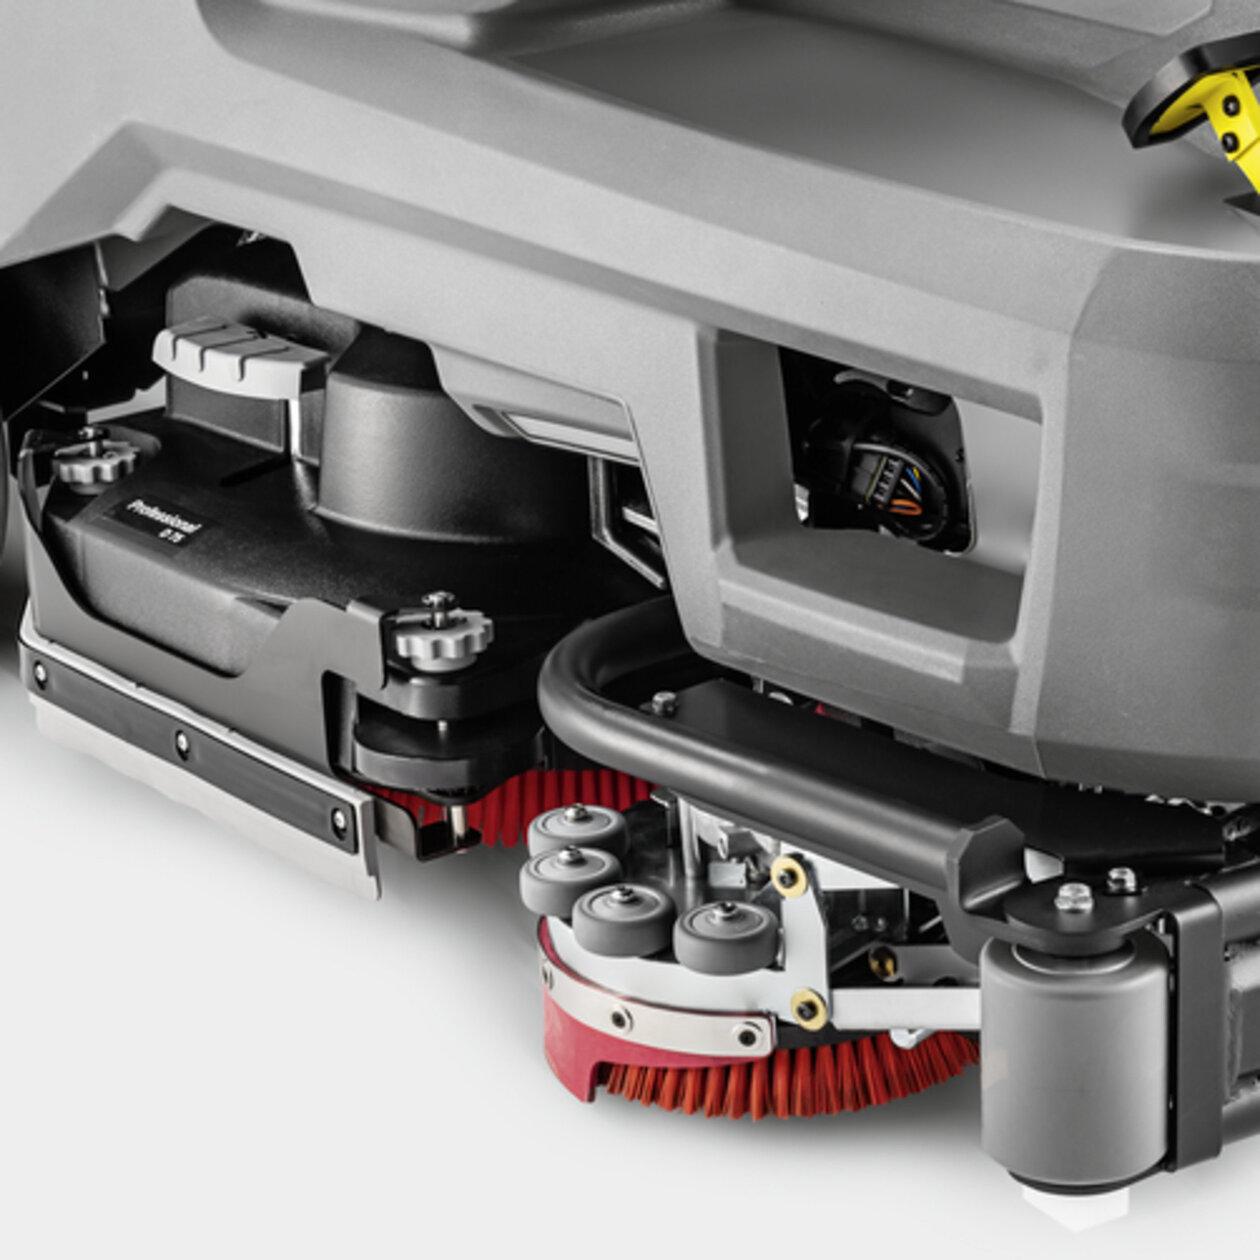 Schrob-/zuigmachine B 110 R Bp Pack 170Ah+Dose+SSD+FleetEU+R75: Tijd- en kostenbesparend zijschrobdek